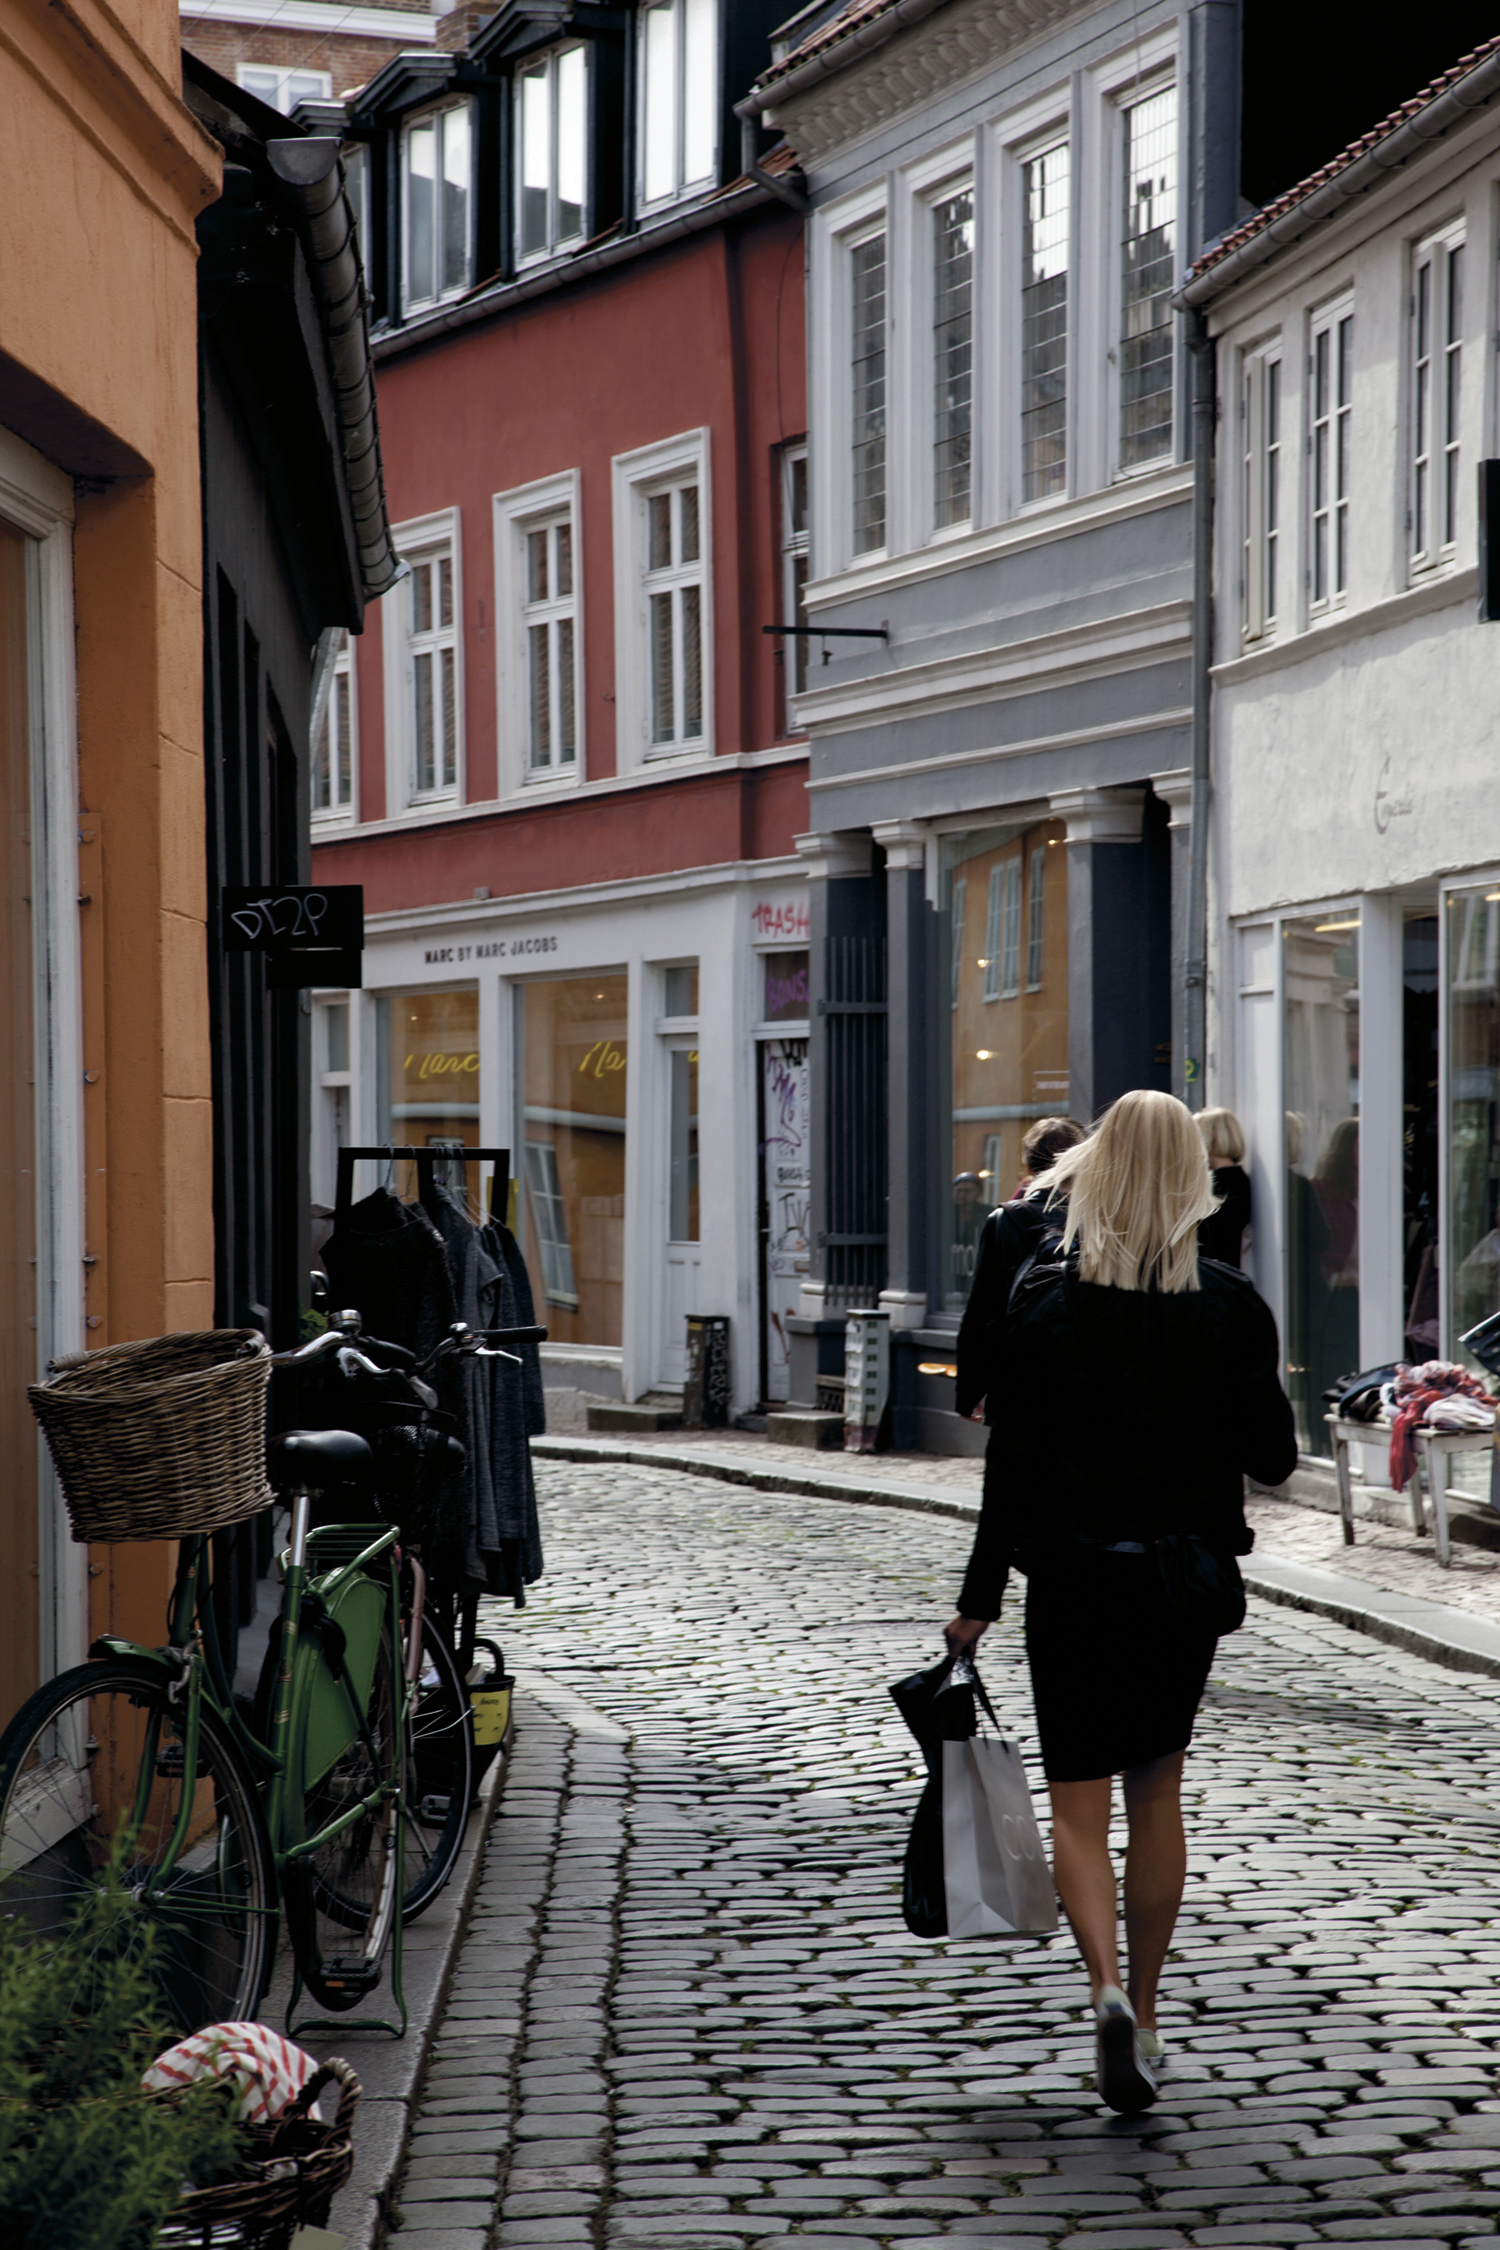 Foto: Denmark MediaCenter/Kim Wyon